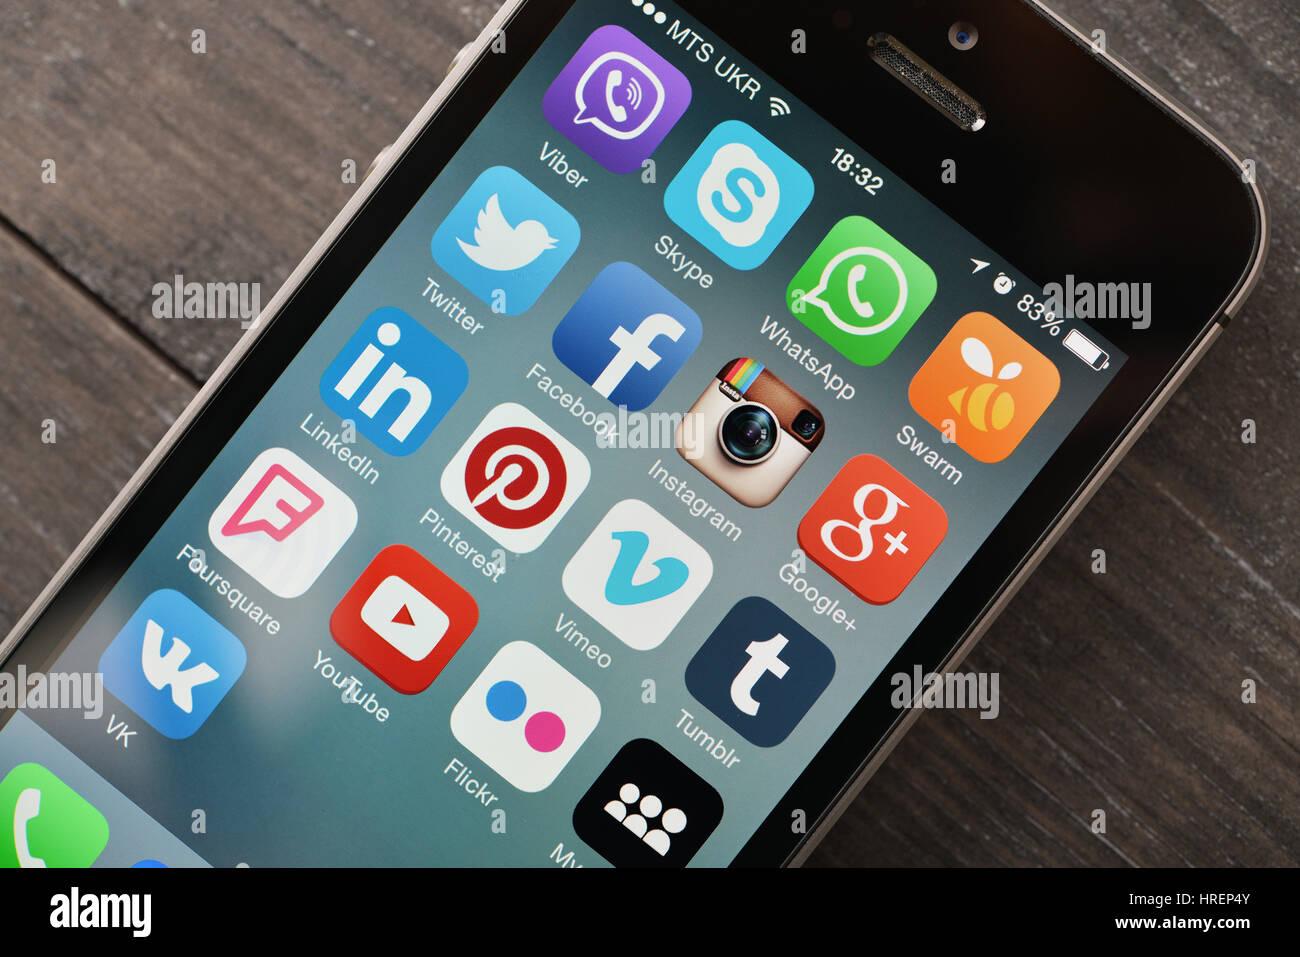 KIEV, UKRAINE - JANUARY 29, 2015: Social media icons on screen of smartphone . Social media are most popular tool - Stock Image